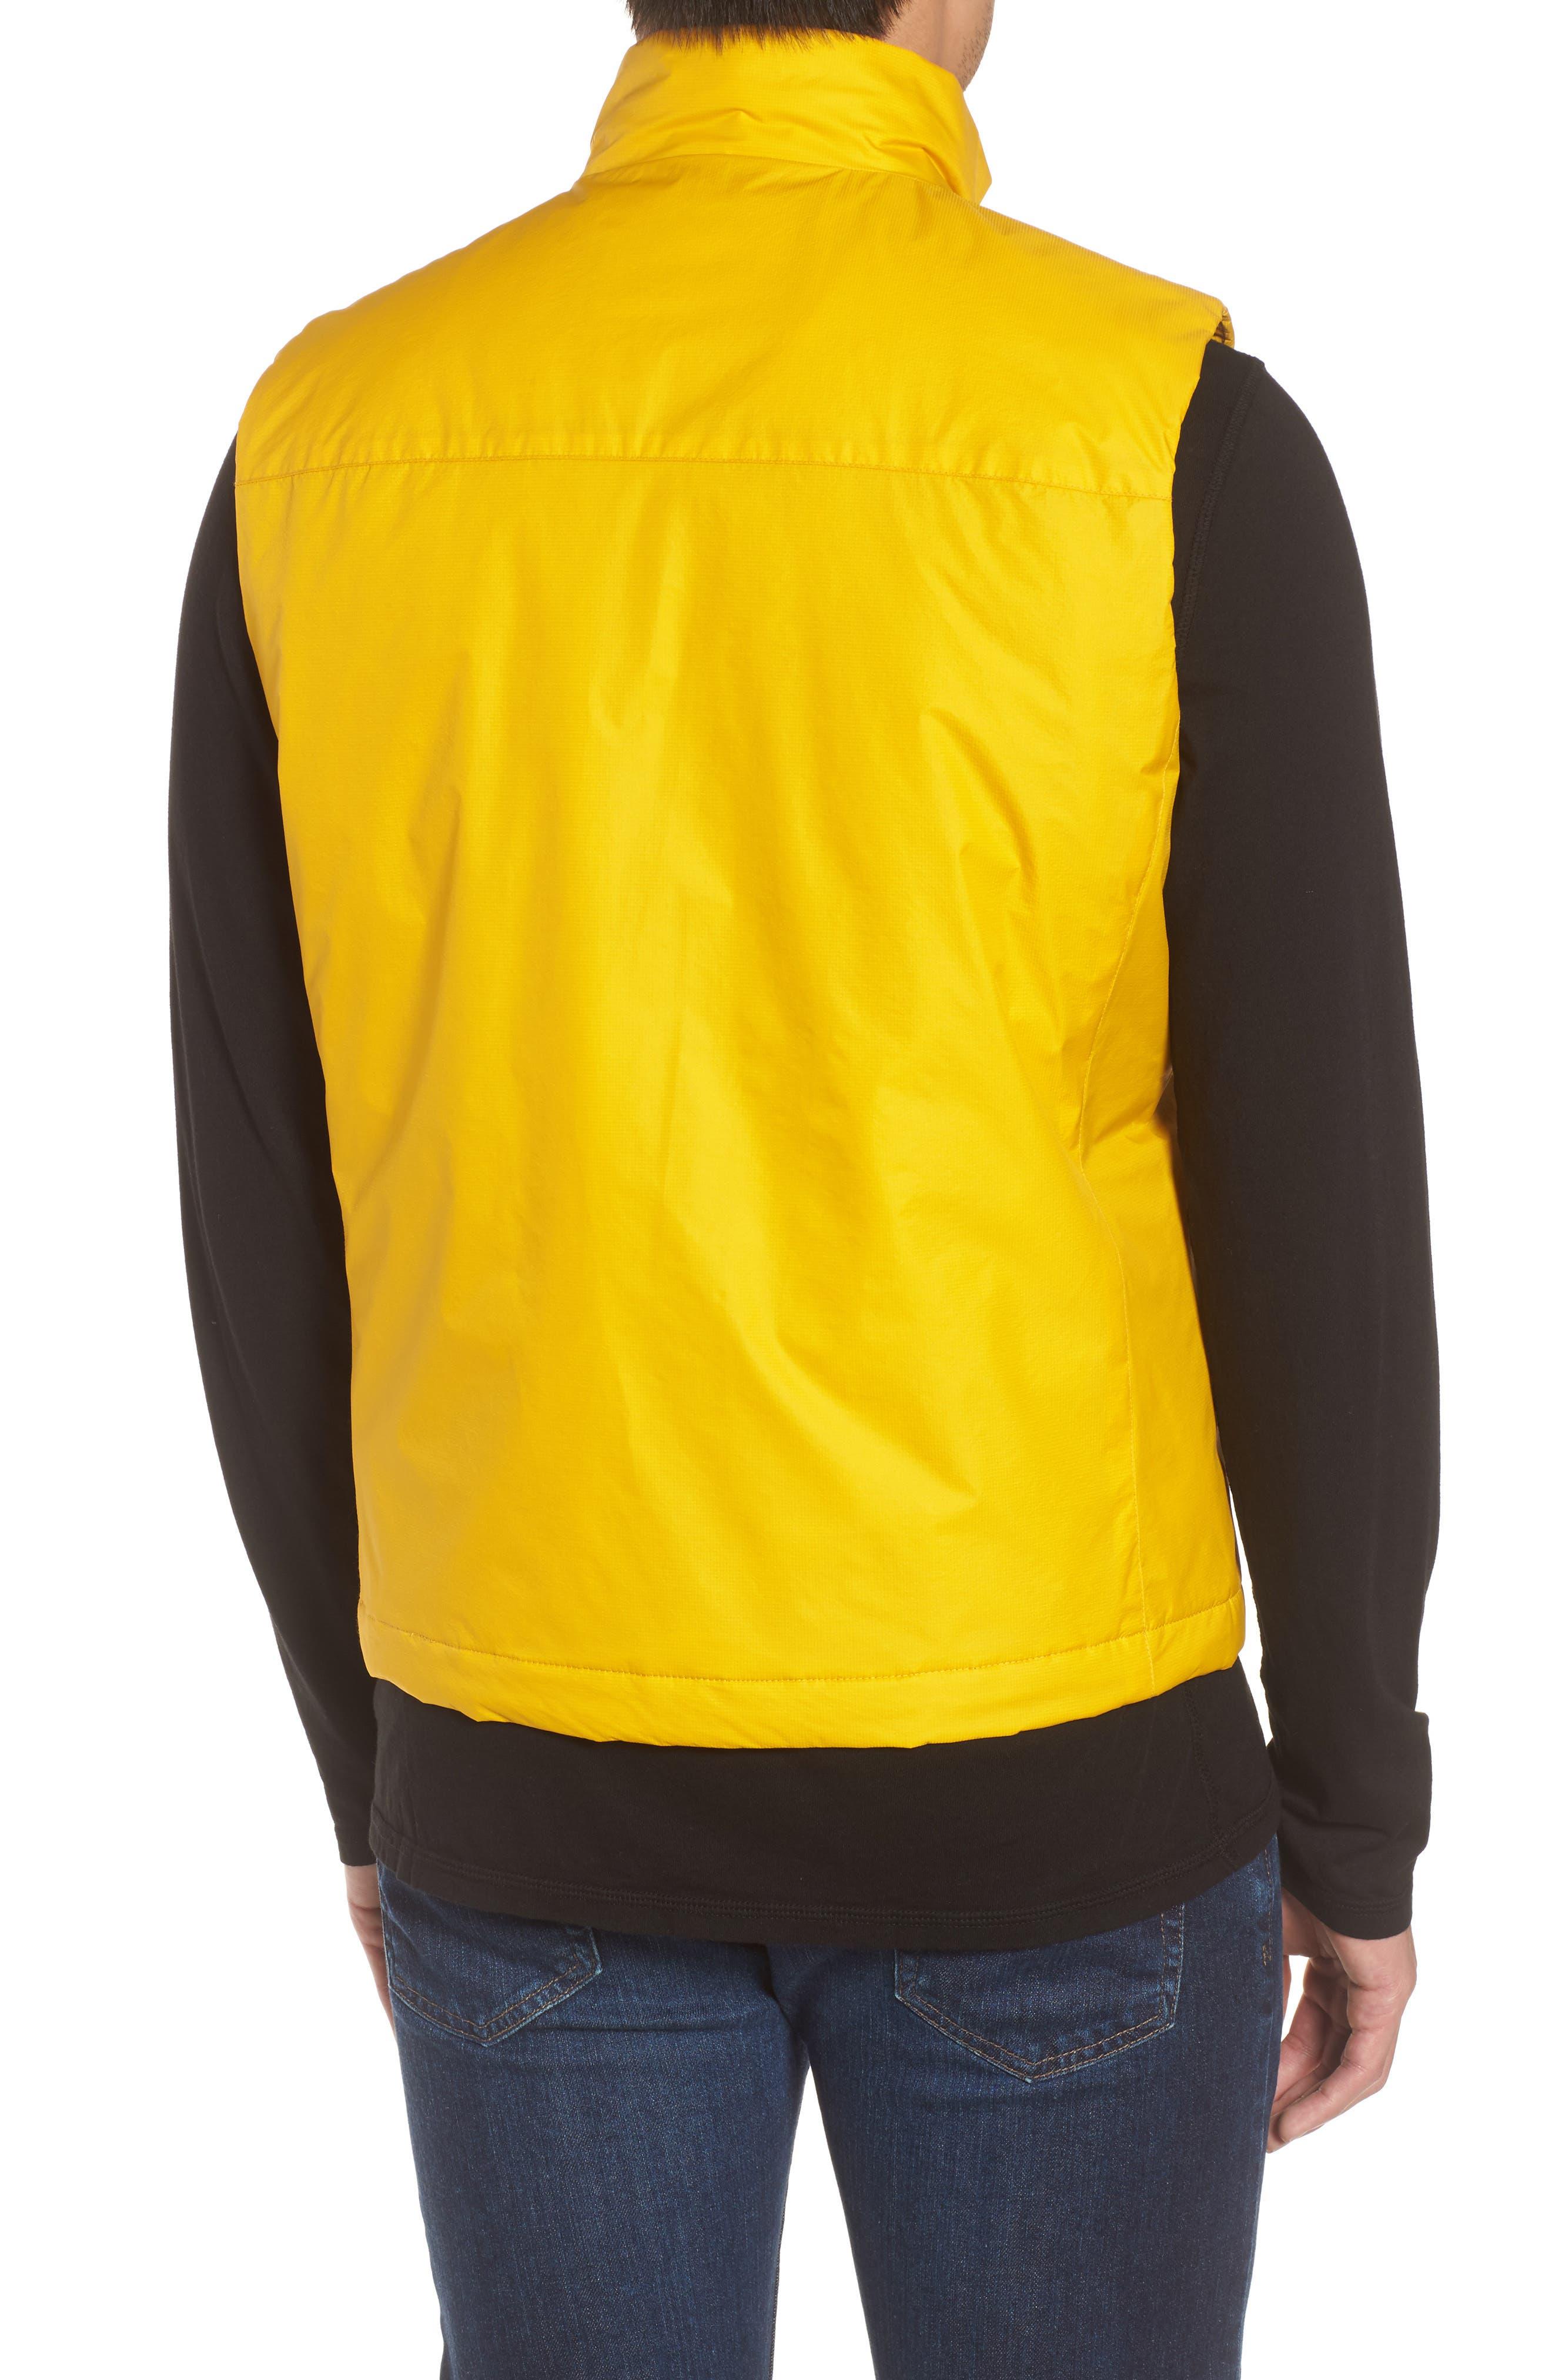 & Bros. Bering Vest,                             Alternate thumbnail 2, color,                             Golden Spice